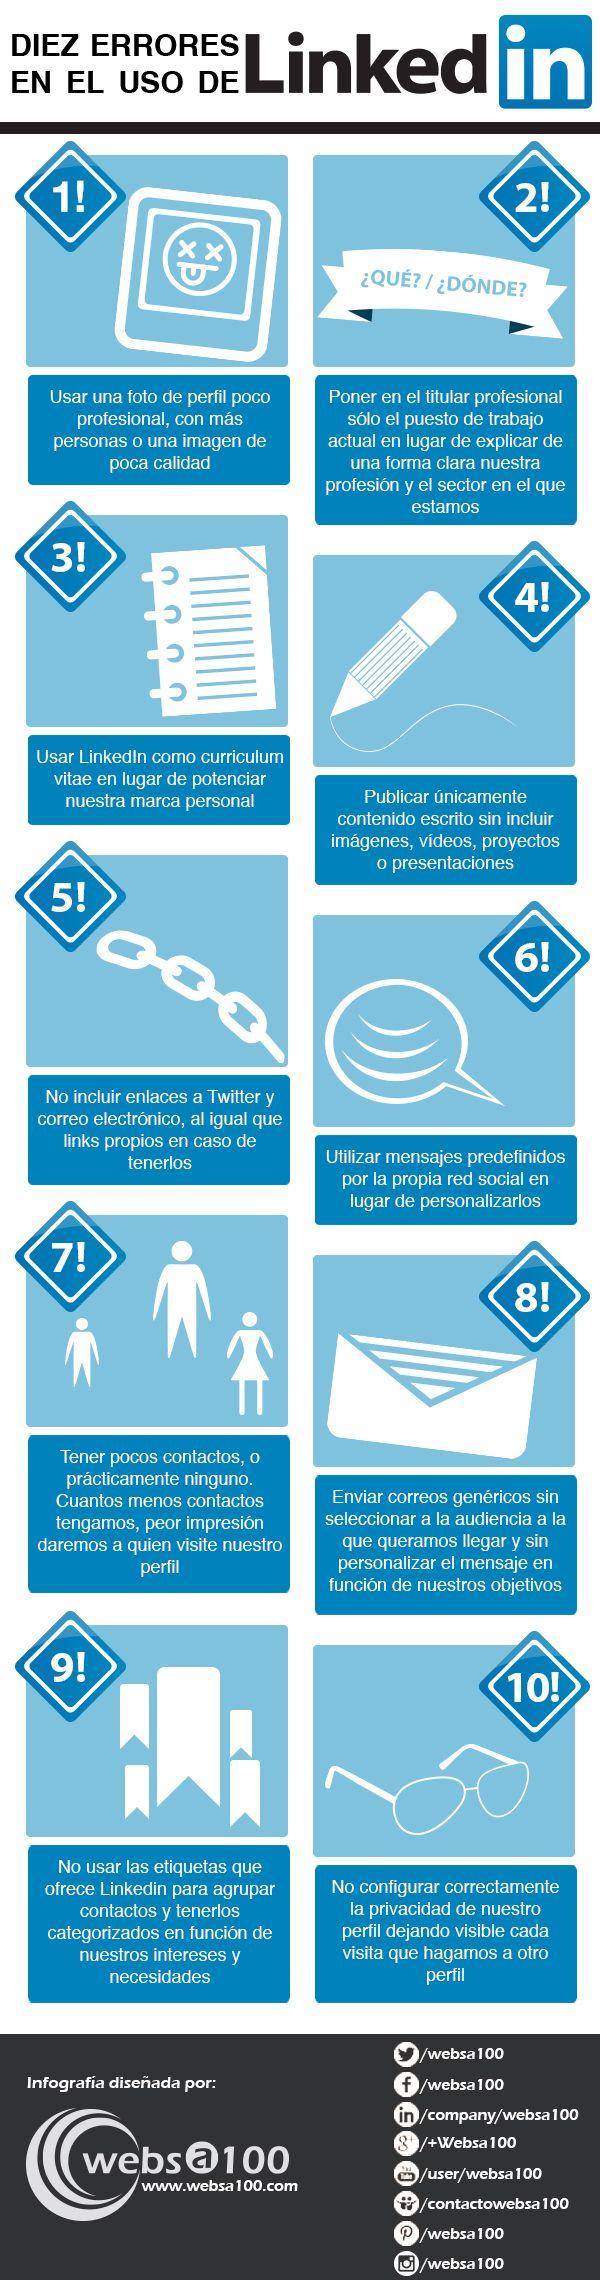 10 errores en el uso de Linkedin Infografia en español. #CommunityManager